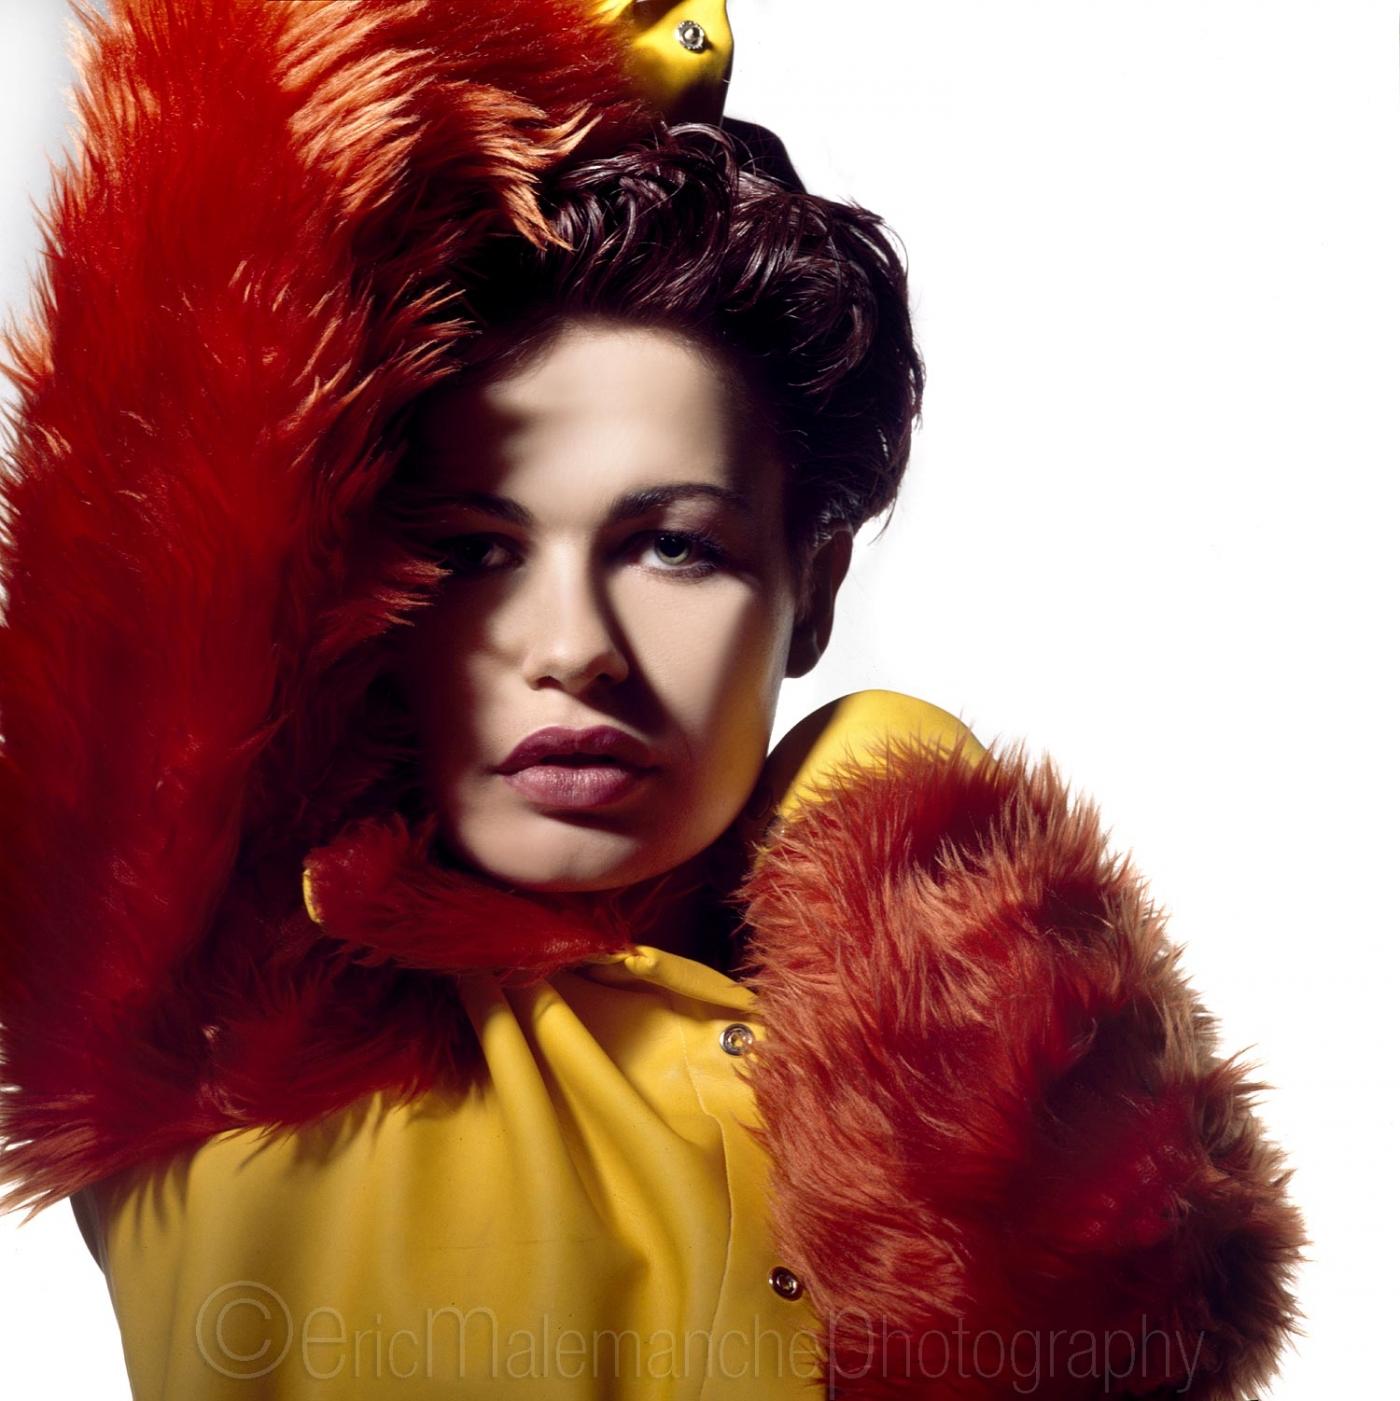 http://www.ericmalemanche.com/imagess/topics/fashion-90-s/liste/Fashion-02.jpg